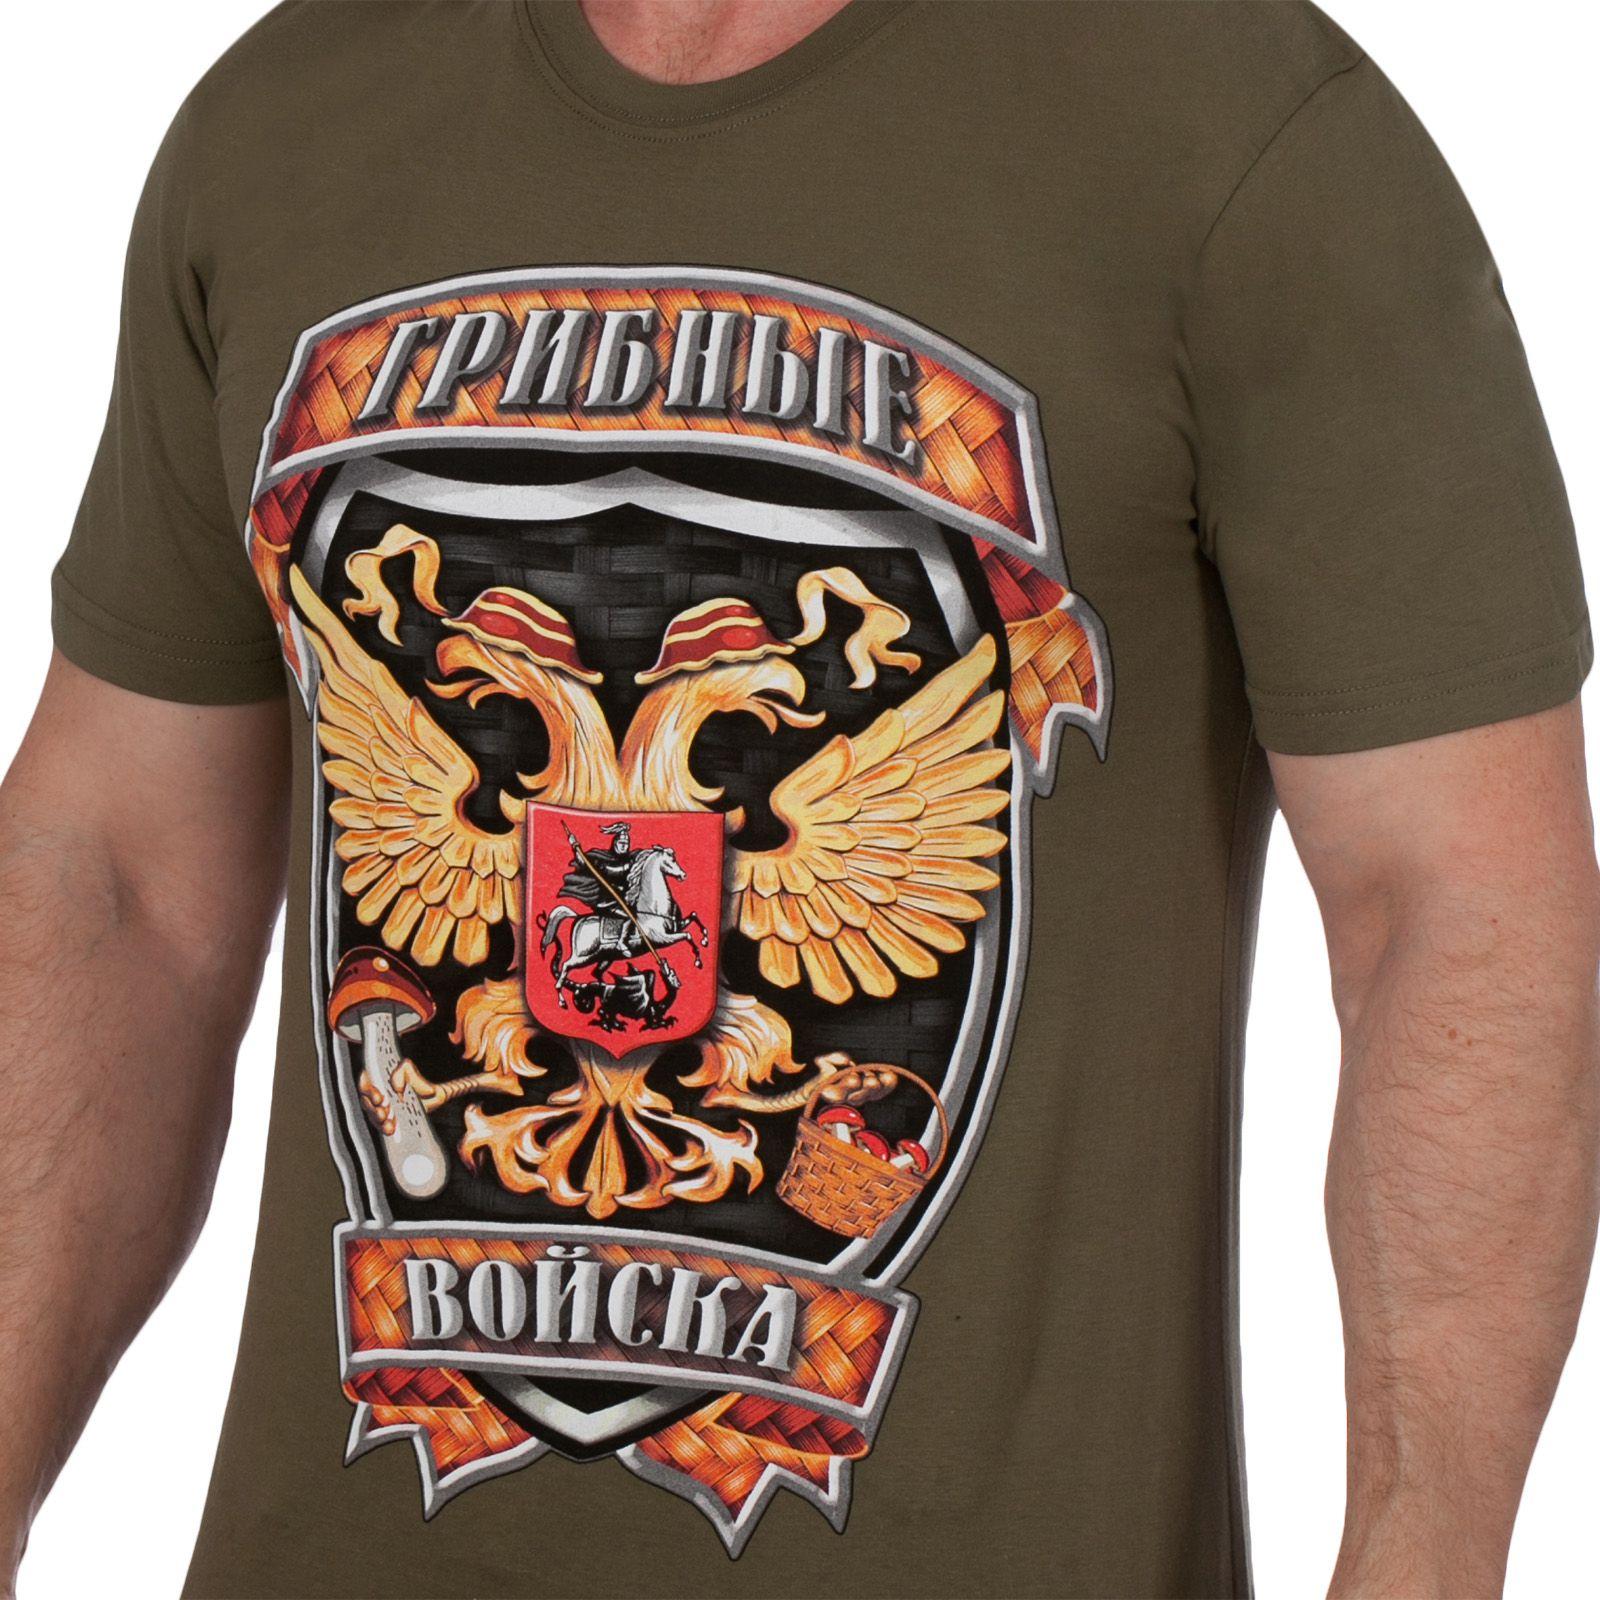 Купить футболку для Грибника в военторге Военпро